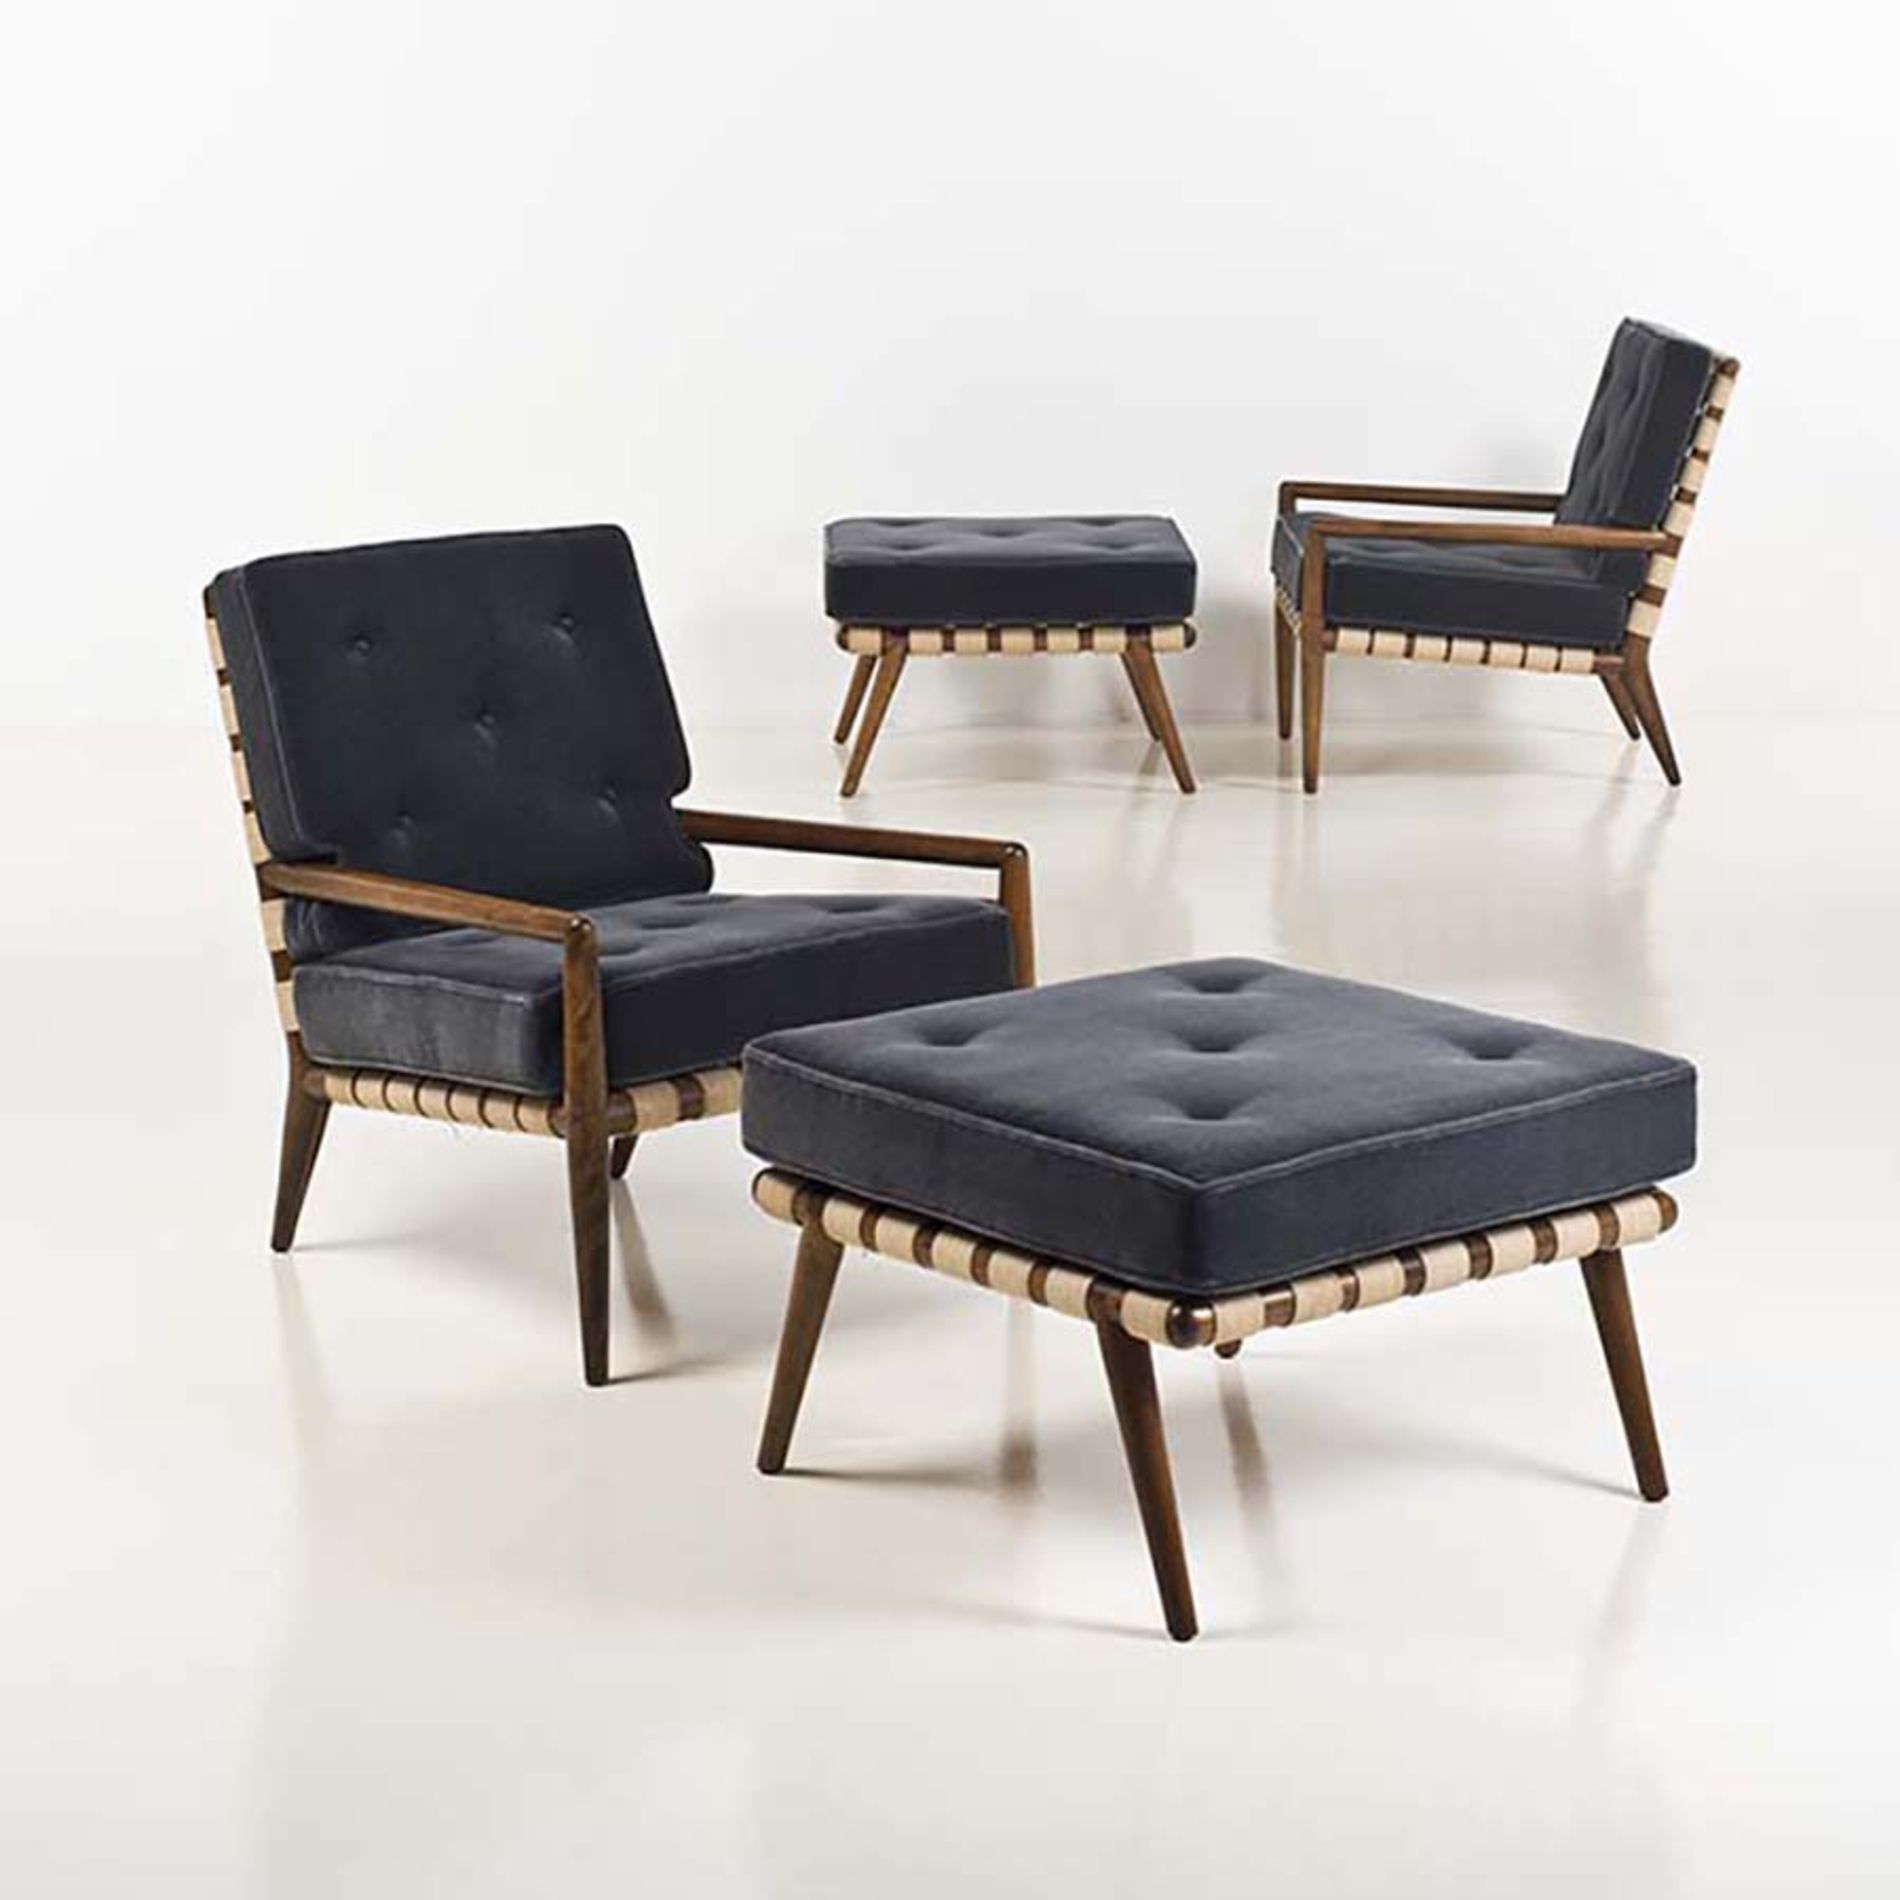 T.H. Robsjohn-Gibbings; Lounge Chair and Ottoman for Widdicomb ...